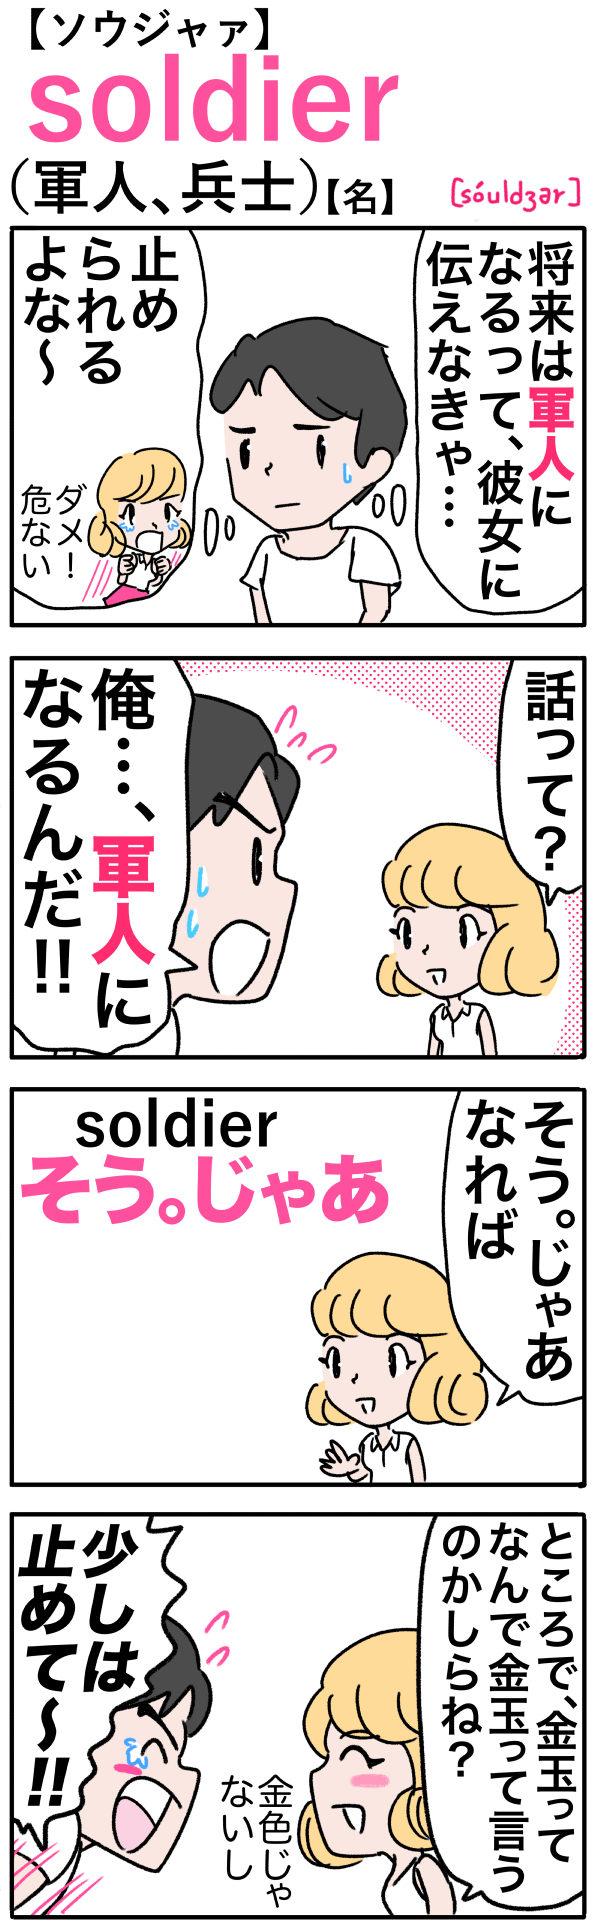 soldier(軍人、兵士)の語呂合わせ英単語